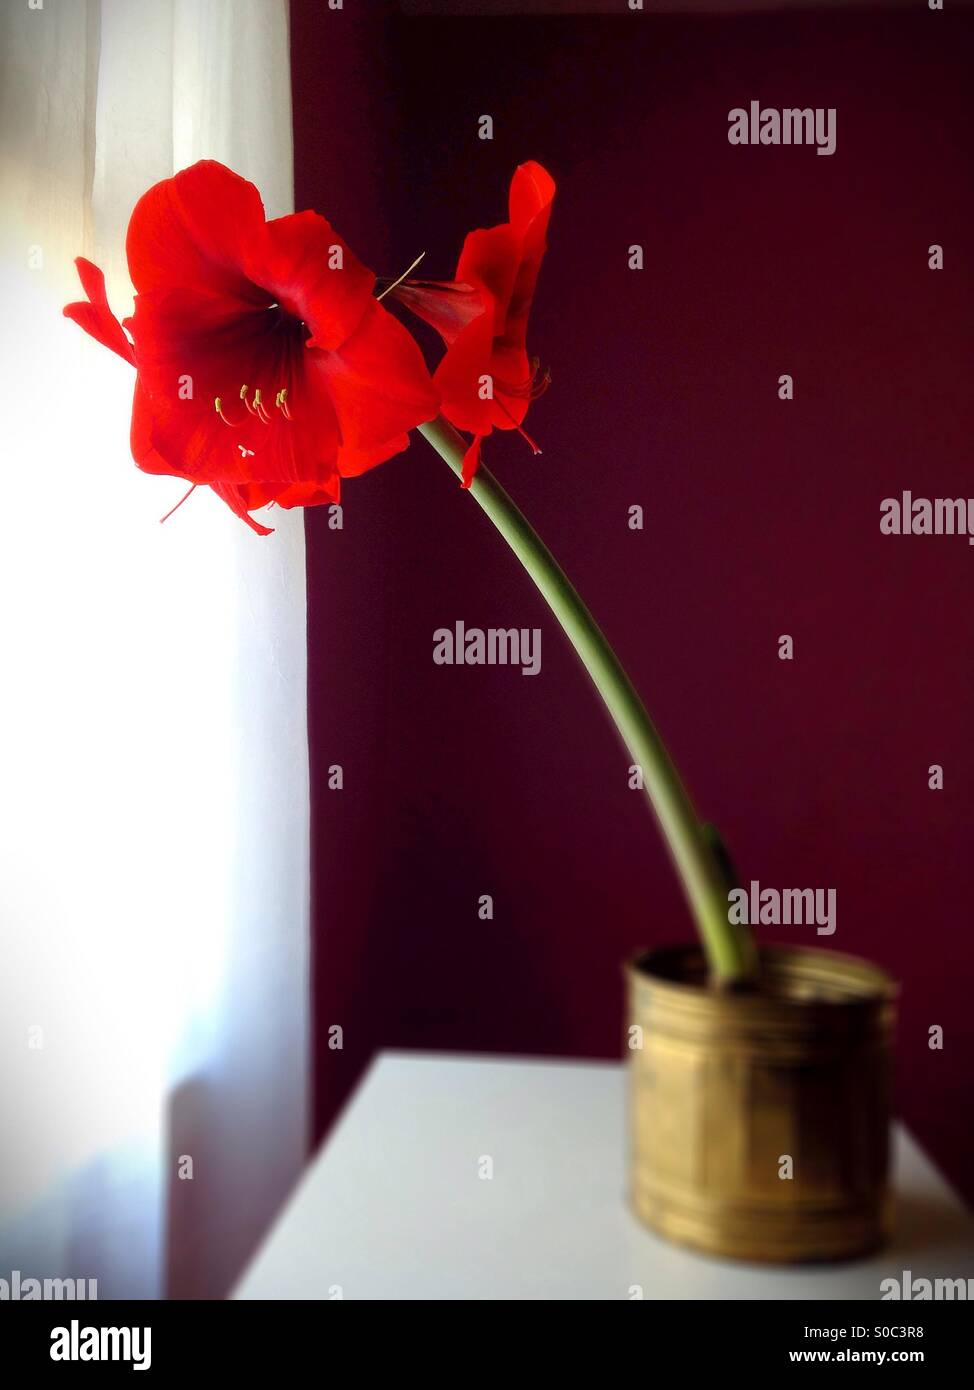 An amaryllis flower. Stock Photo